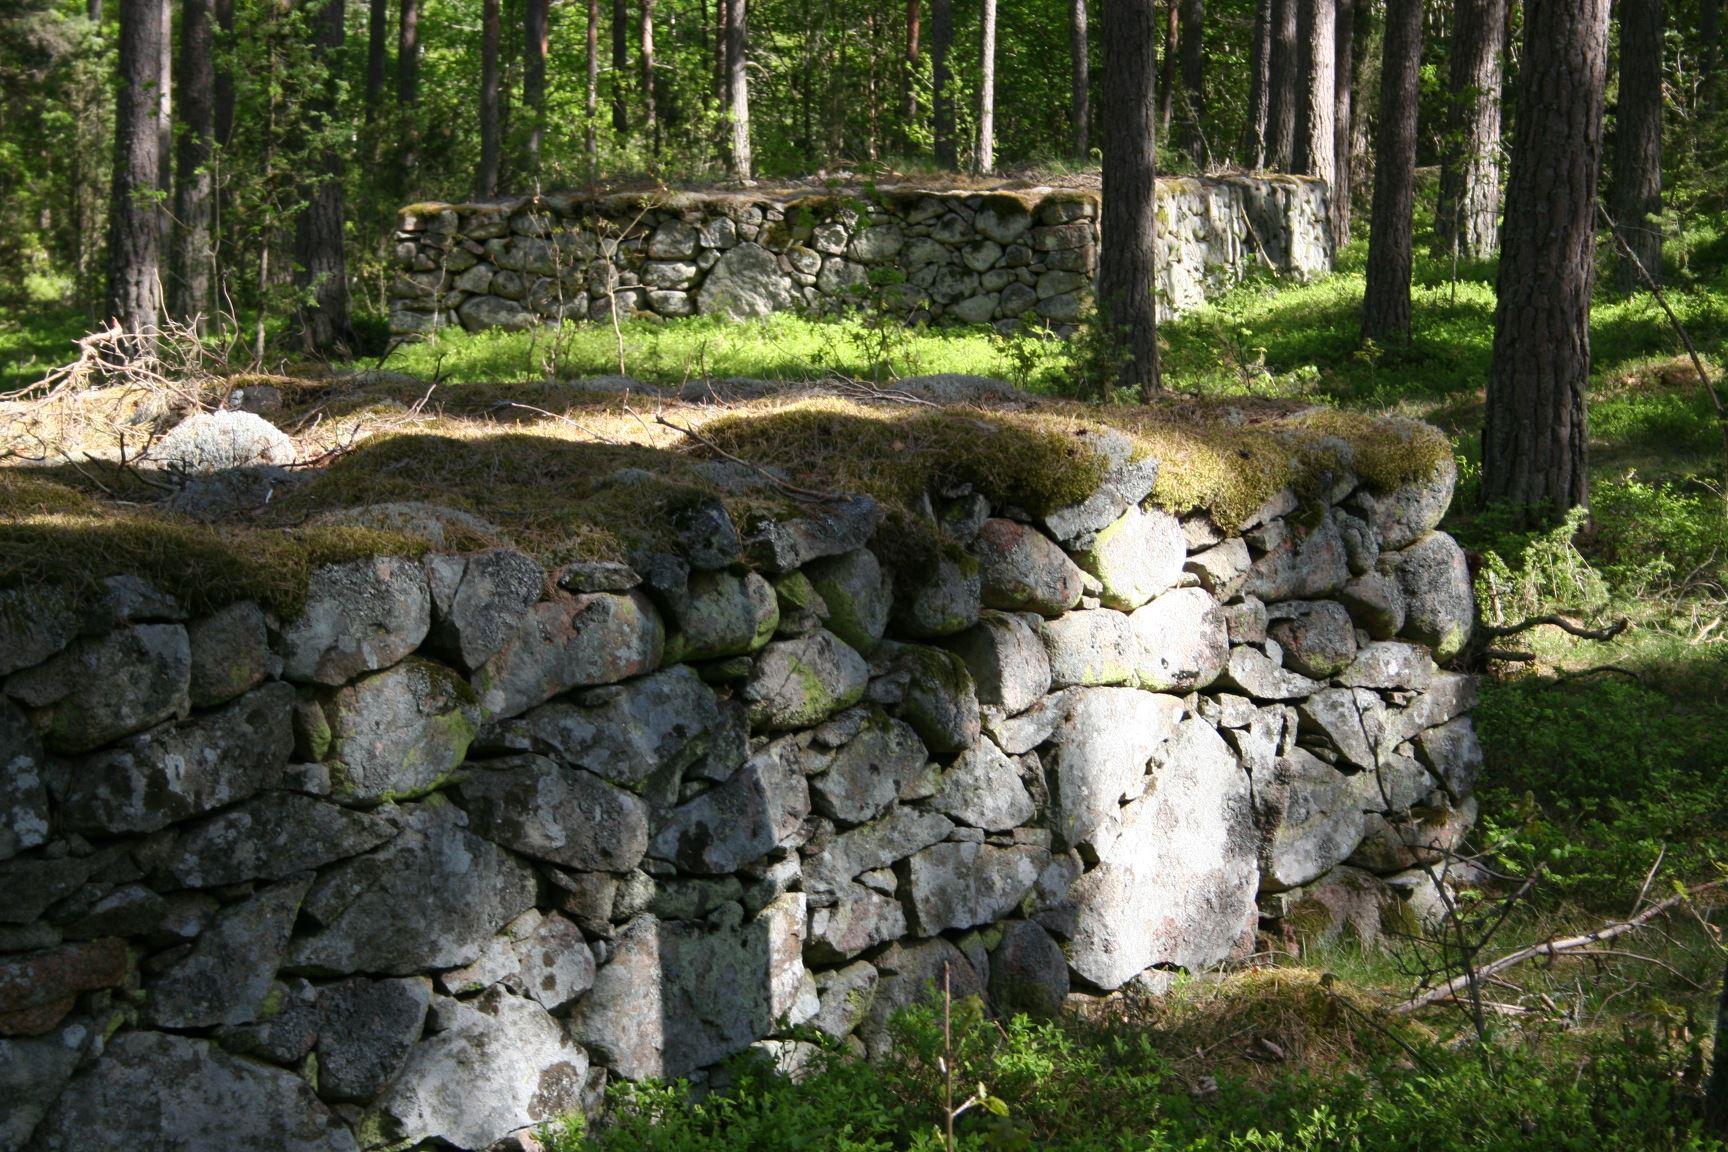 Mårten Stenberg, The Hunger Cairns in Hägerrum